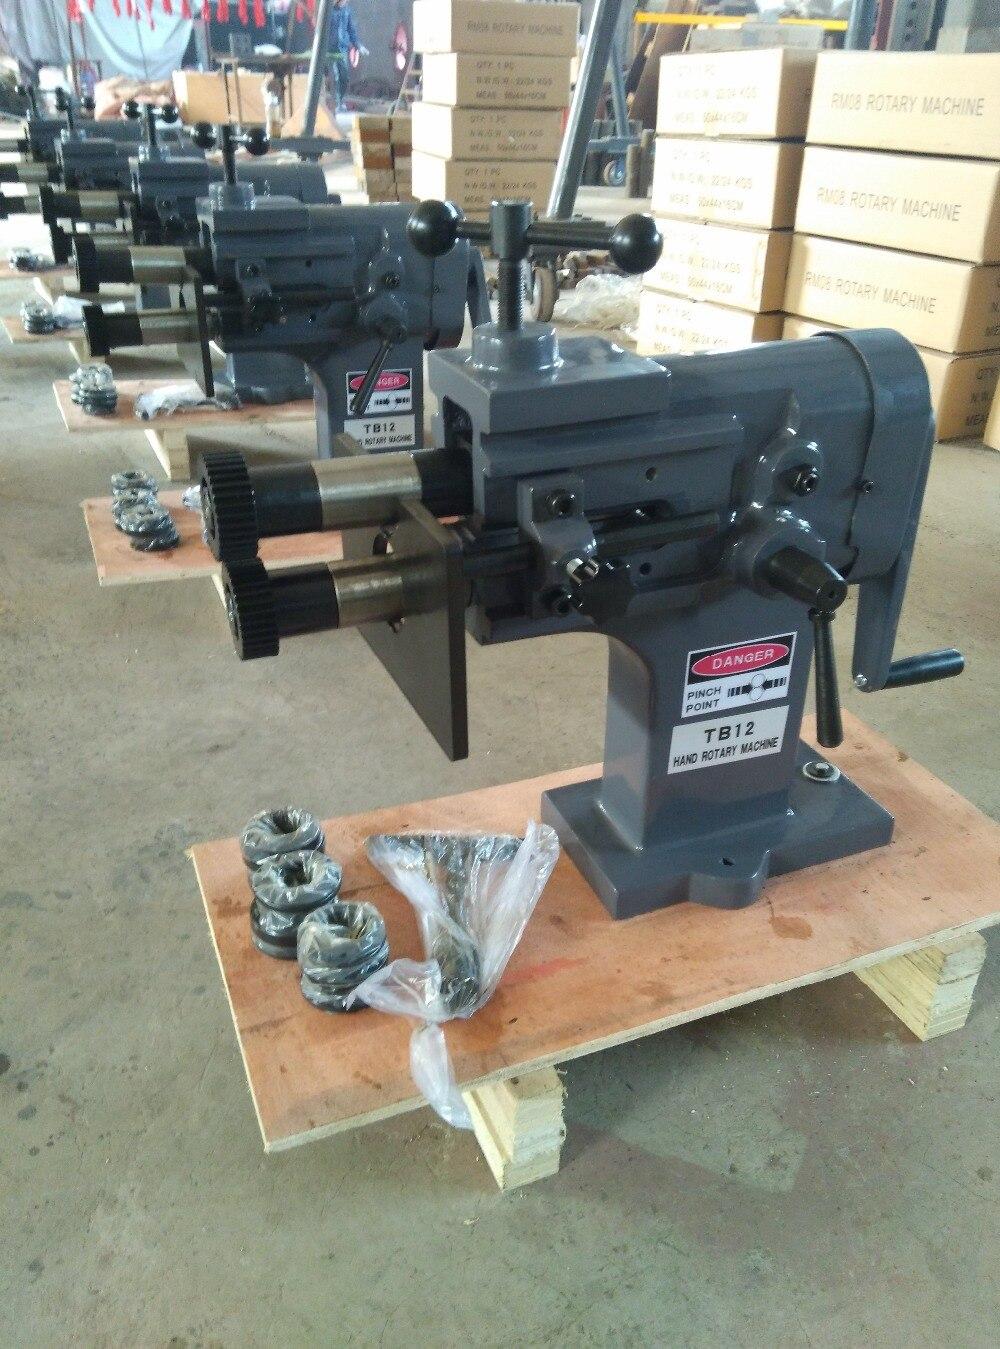 TB 12 metal plates sheet forming rotary machine blank pressing machinery hand tools